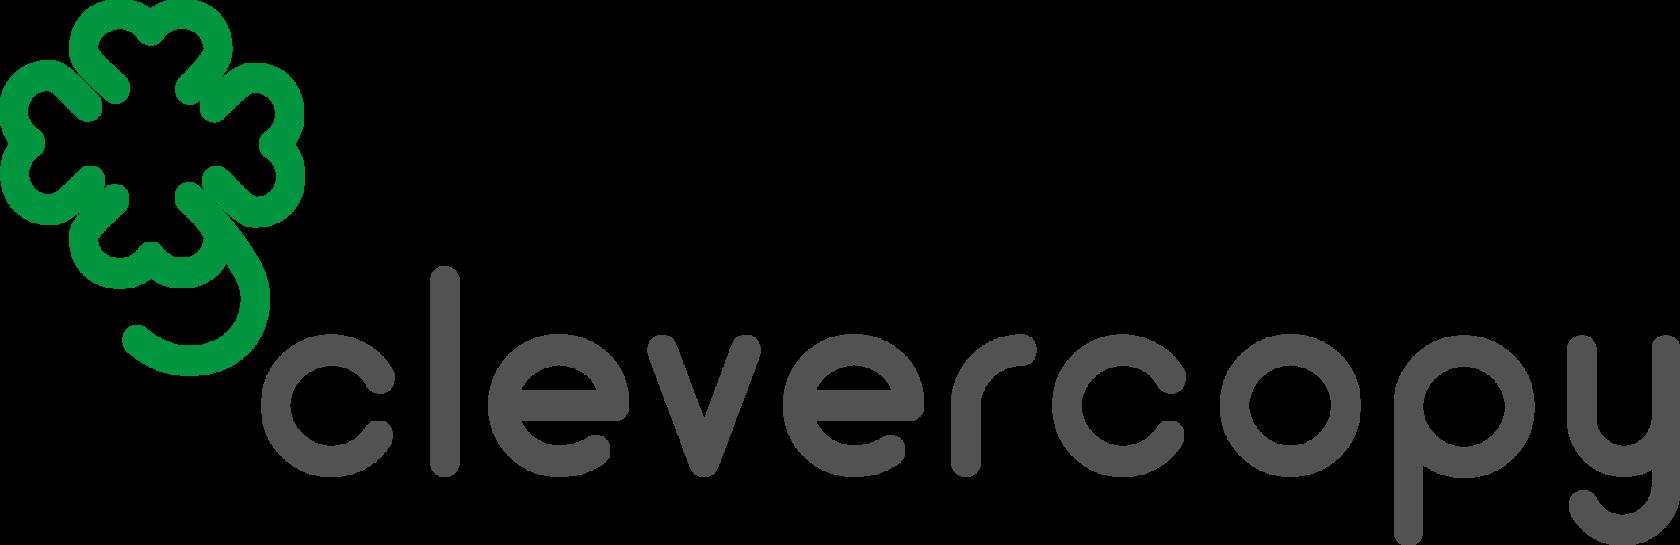 Сlevercopy ☘